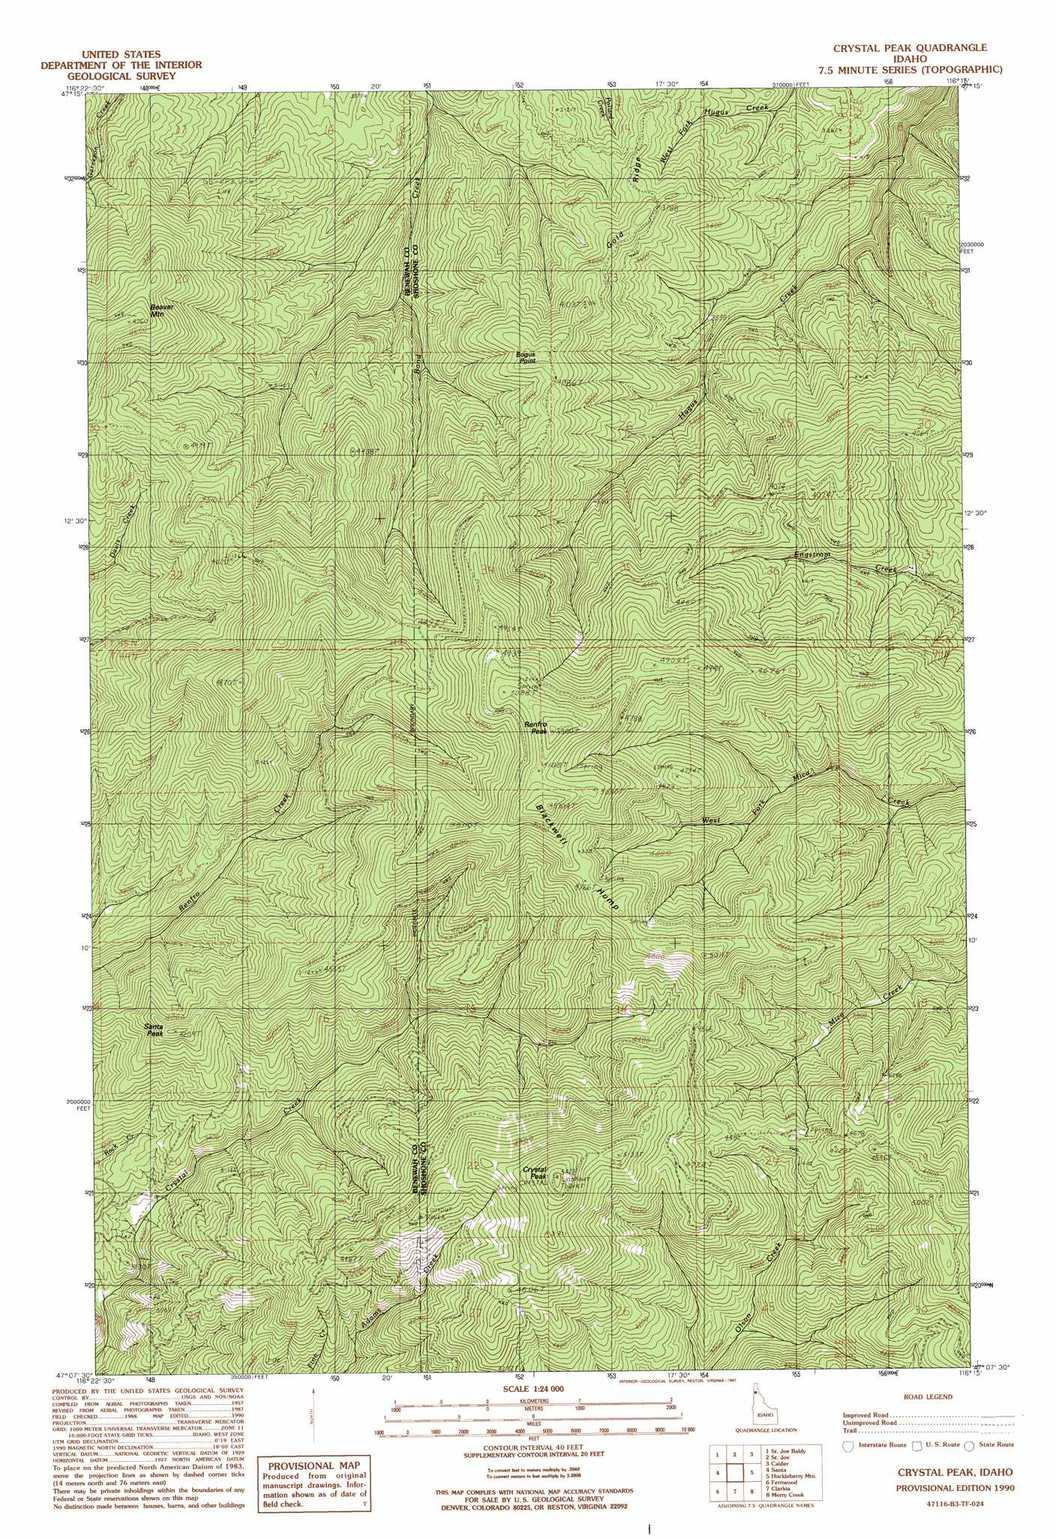 Crystal Peak Topographic Map, Id - Usgs Topo Quad 47116B3